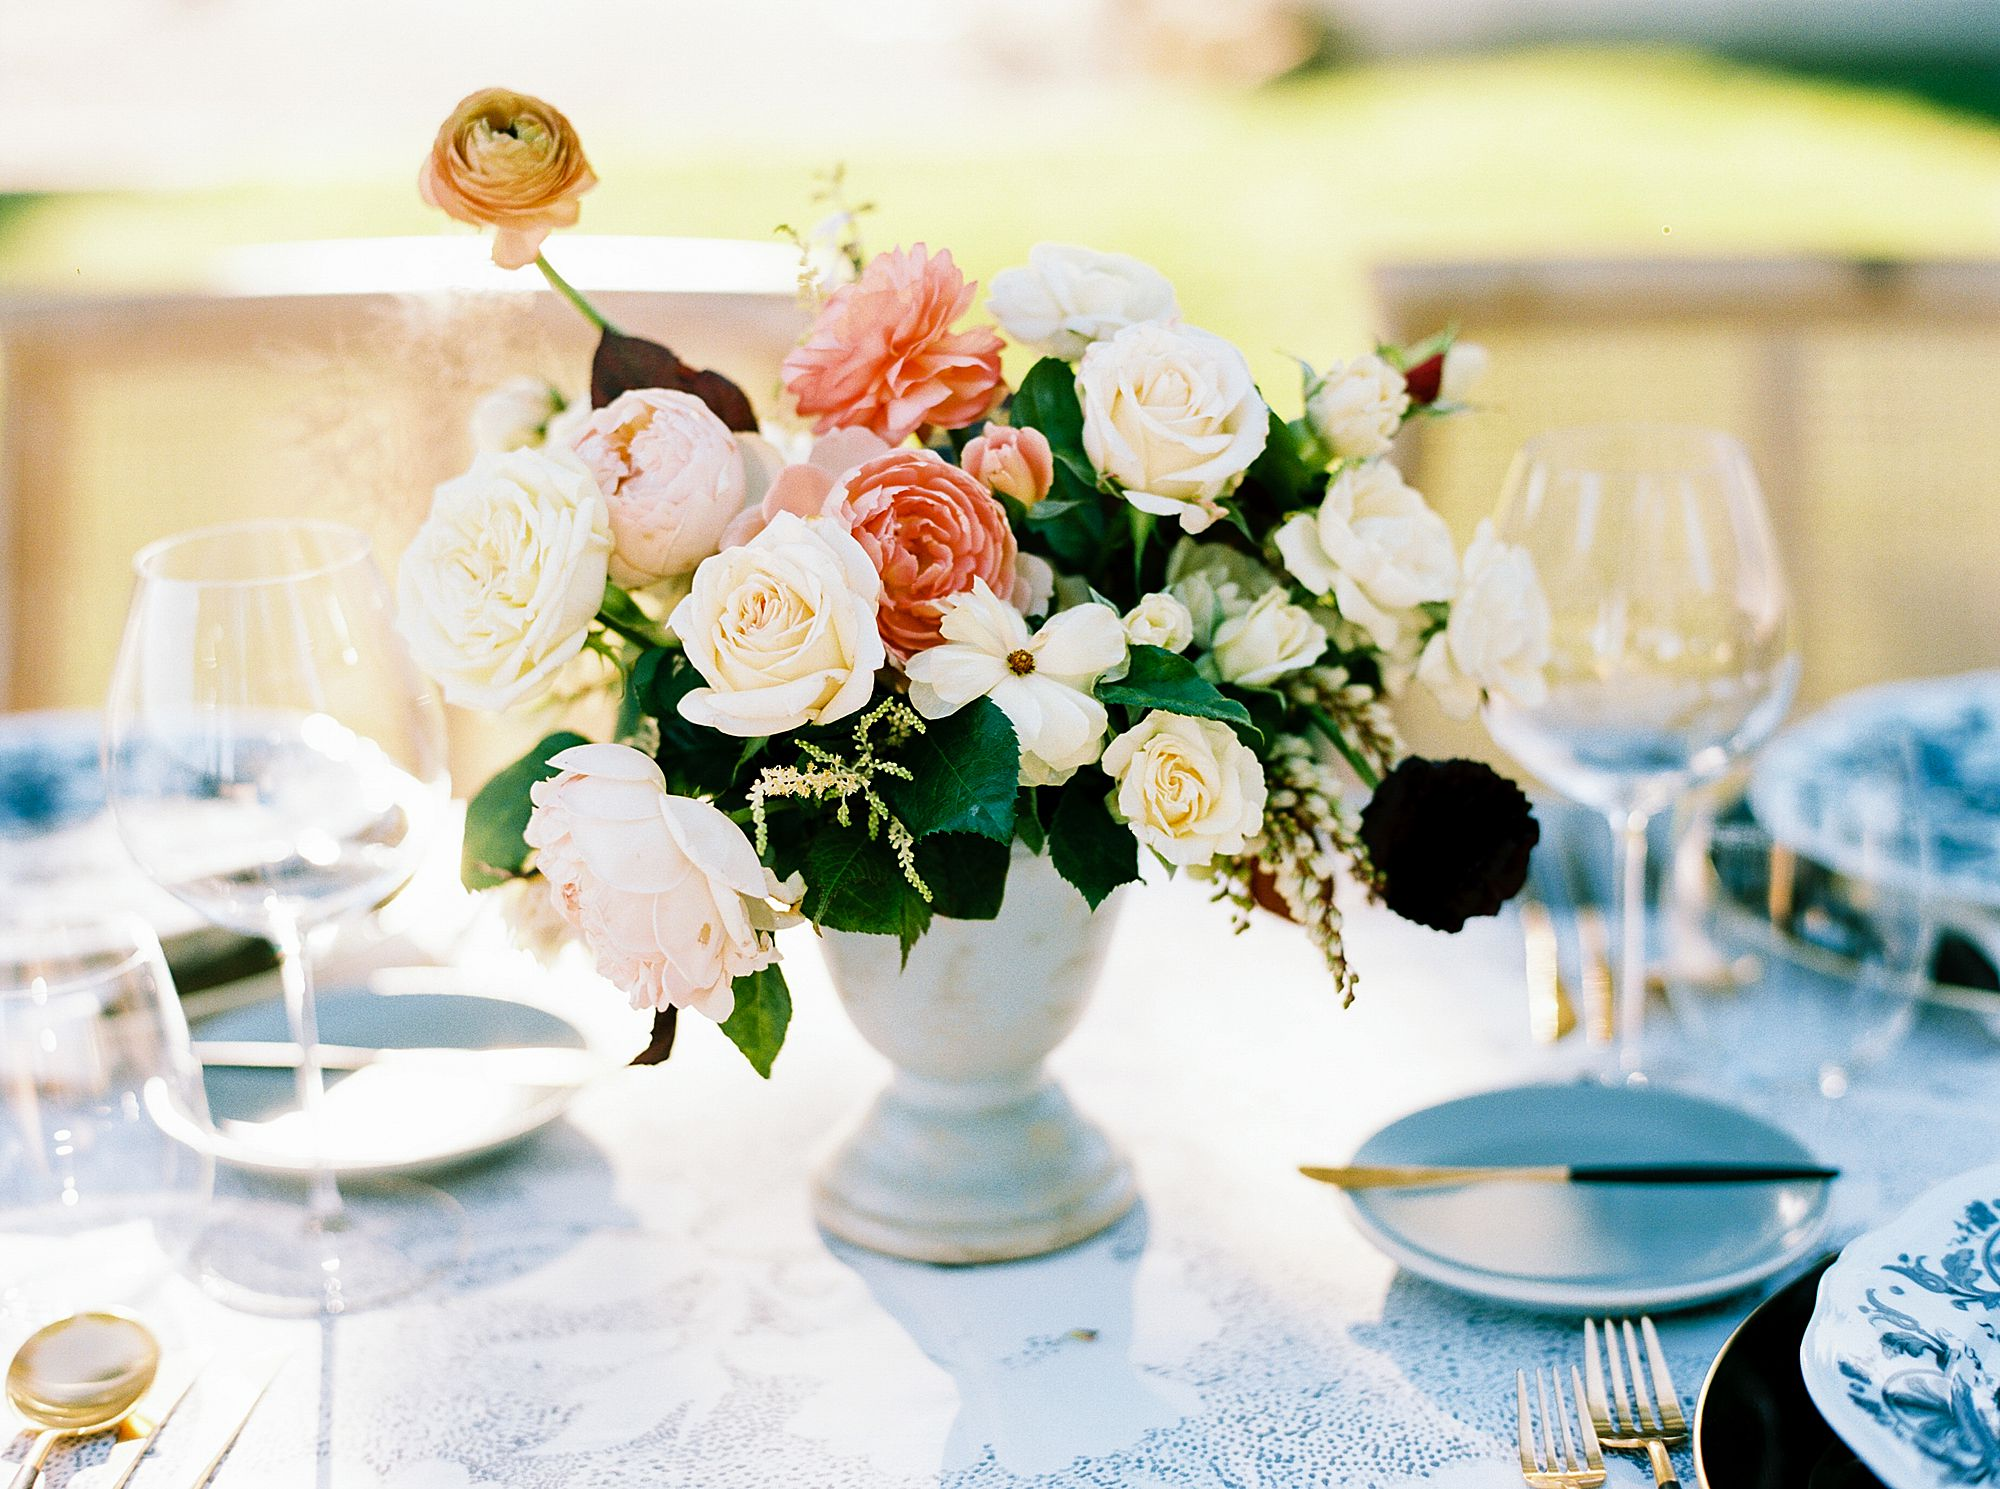 HammerSky Wedding Inspiration Featured on Hey Wedding Lady with Vanessa Noel Events - Ashley Baumgartner - SLO Wedding Photographer_0042.jpg